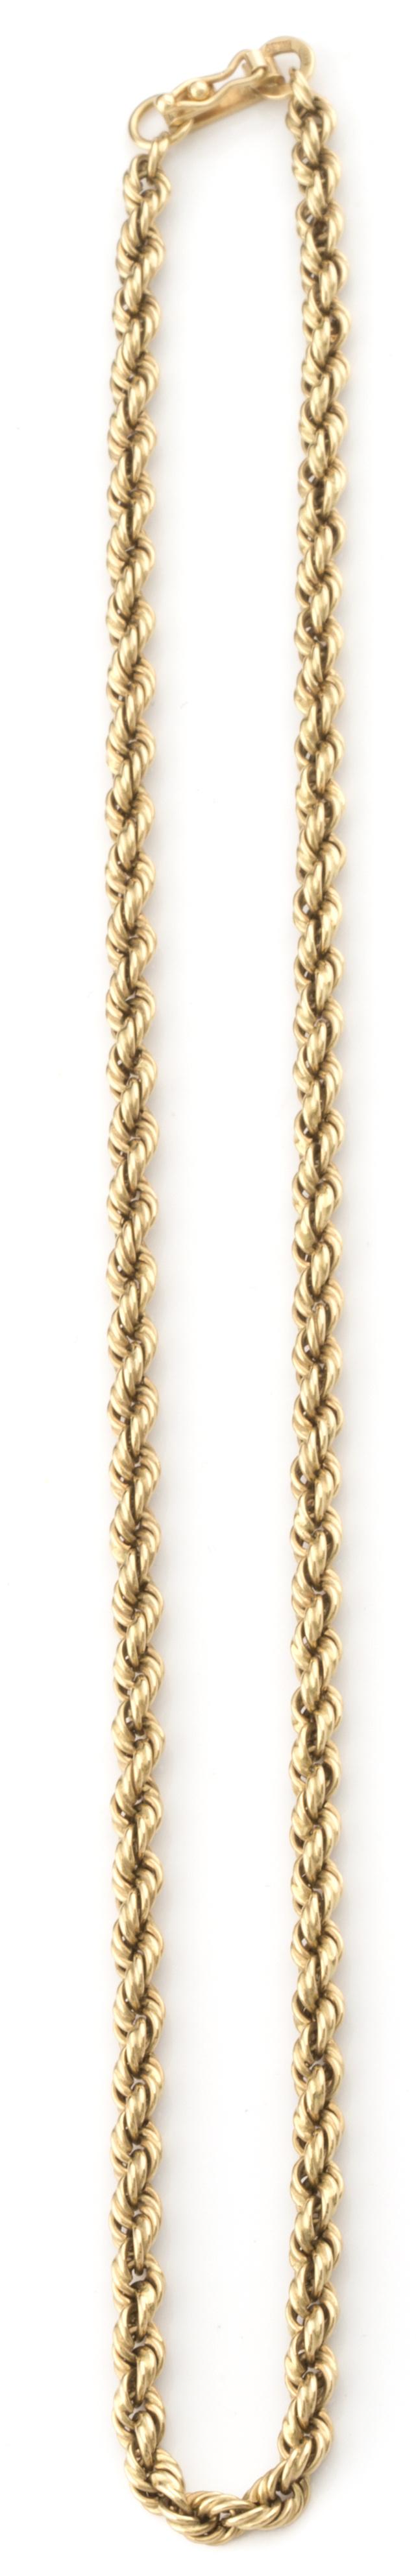 Collar de cordón rizado en oro de amarillo de 18K.